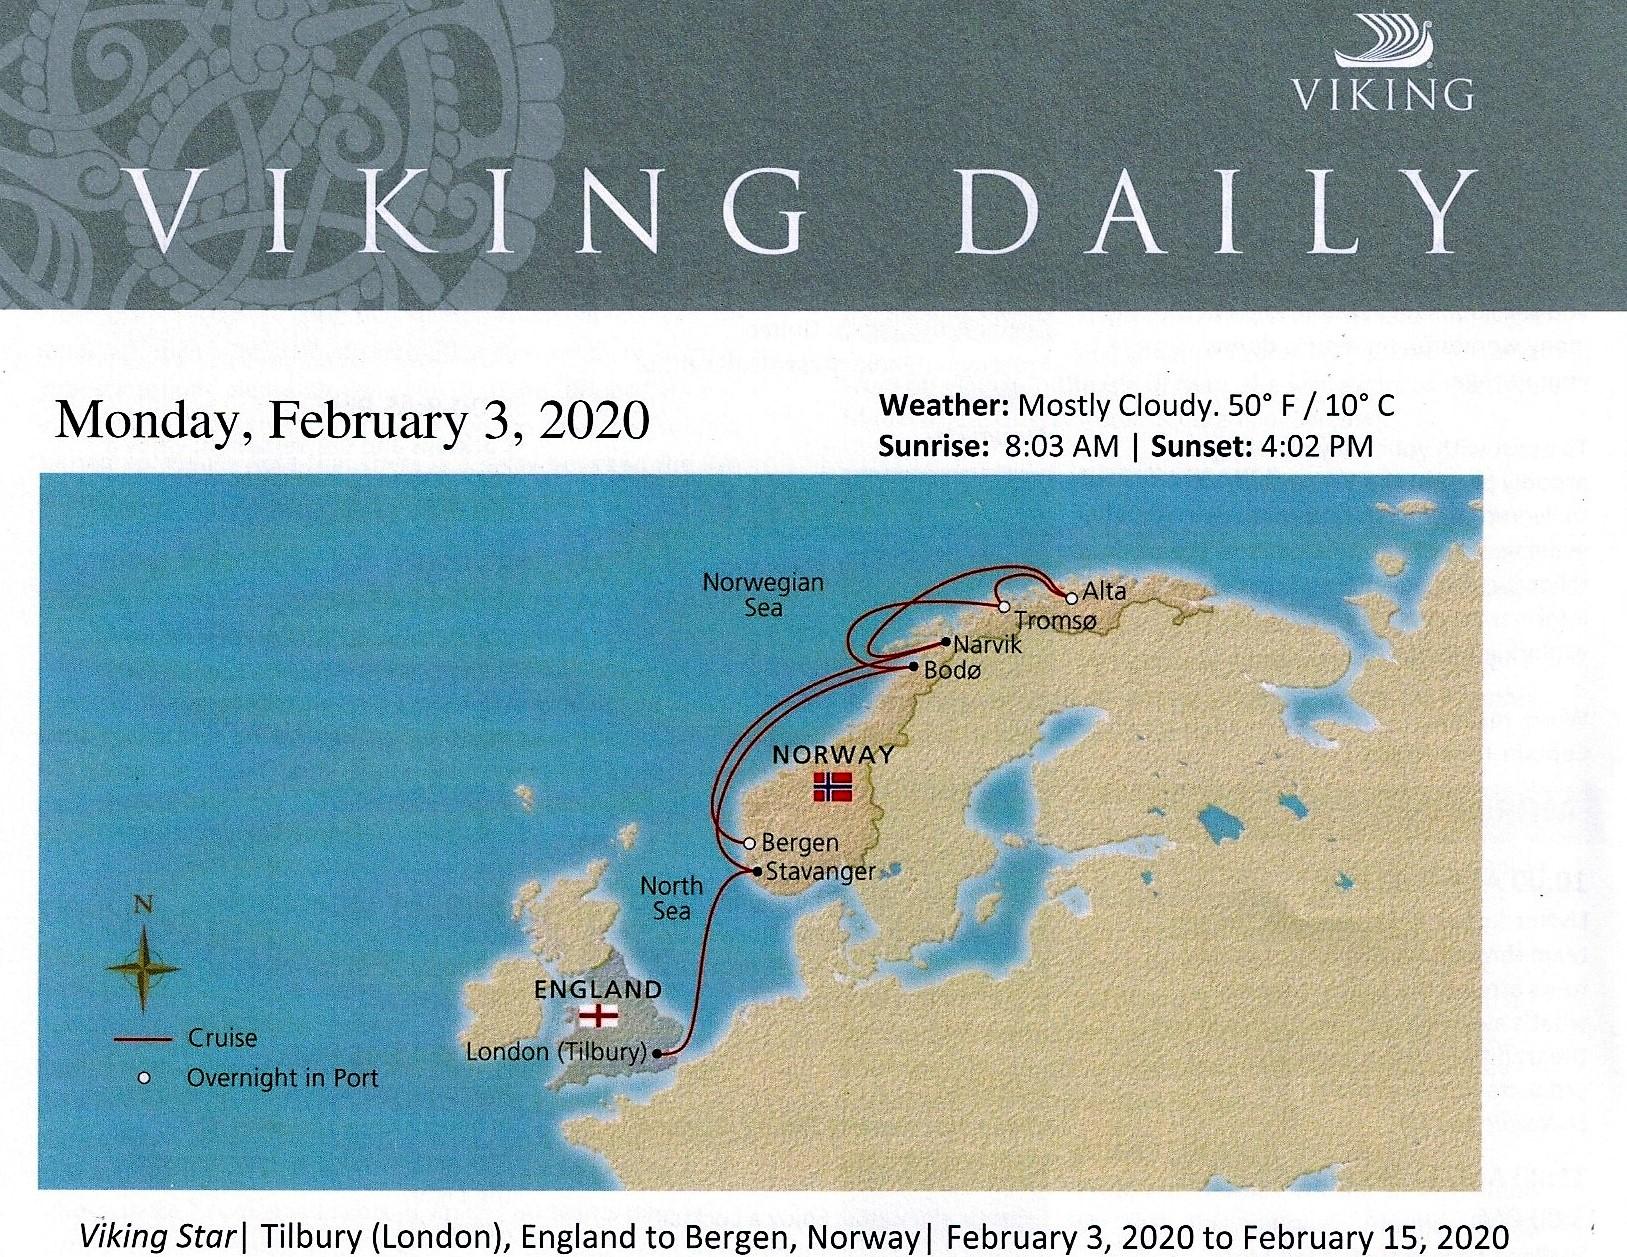 Viking Daily